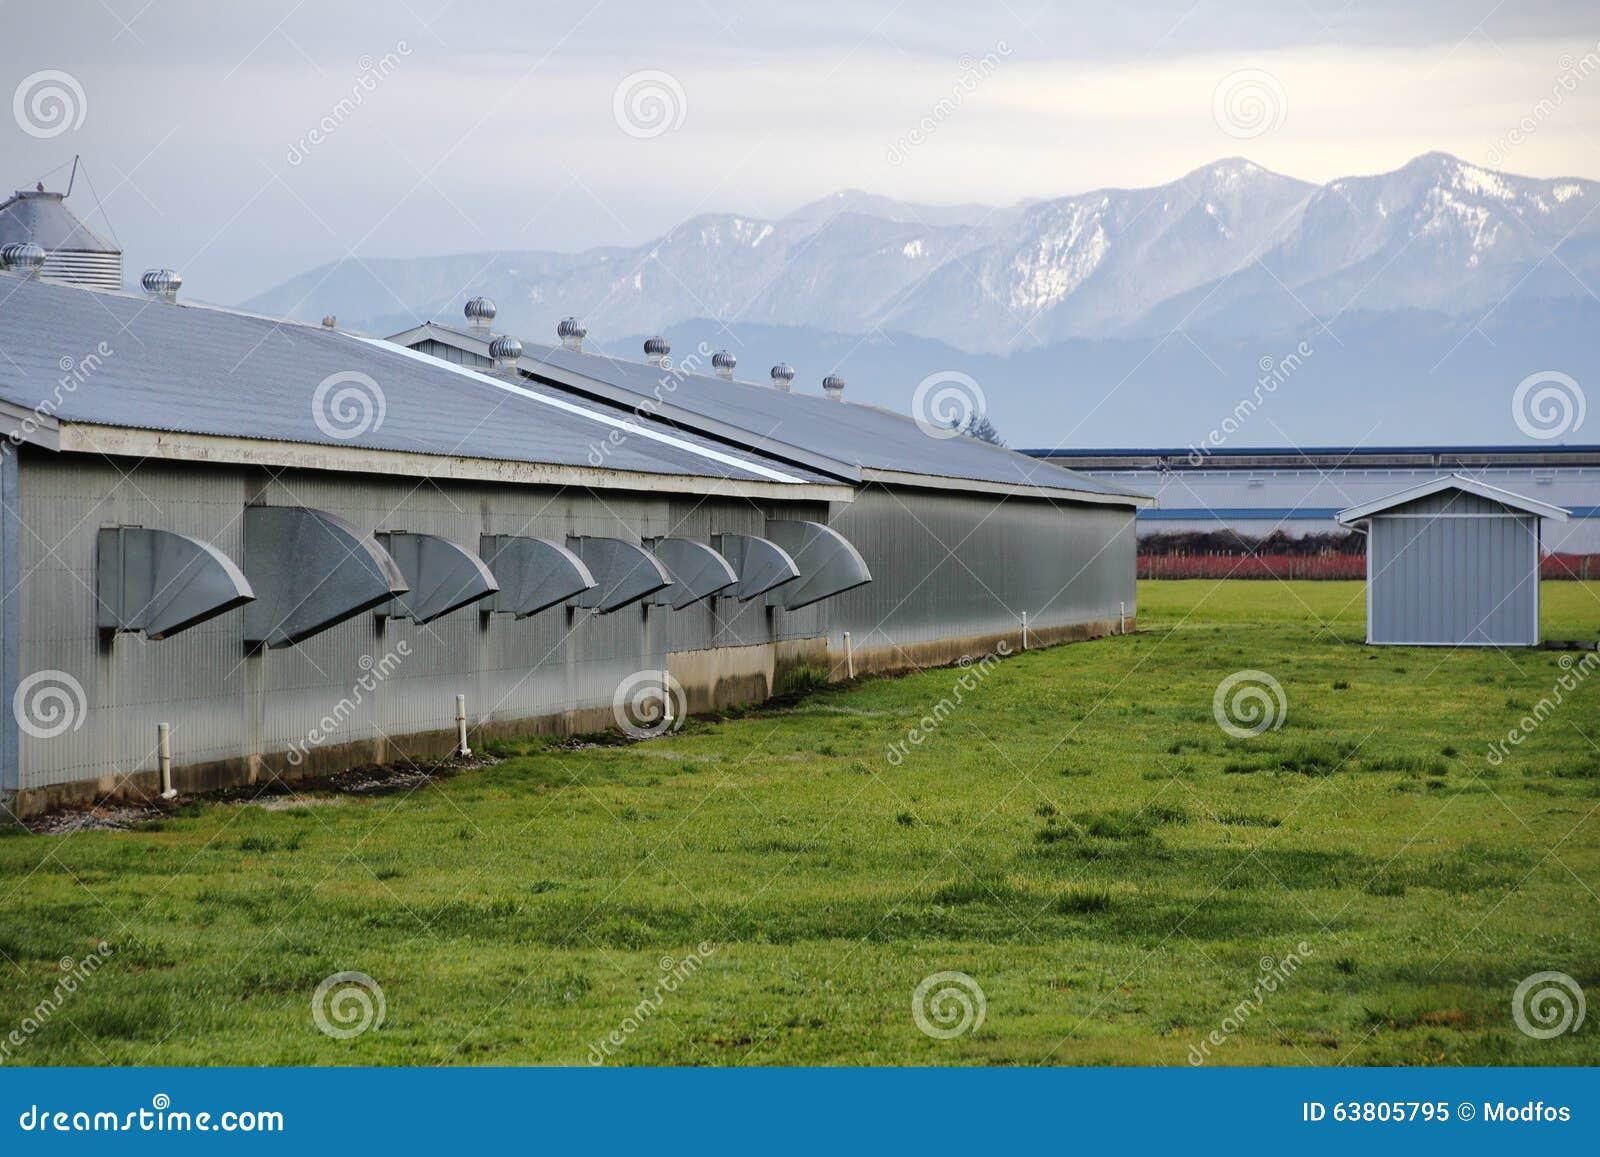 ^ Washington hicken Farm Stock Photo - Image: 63805795